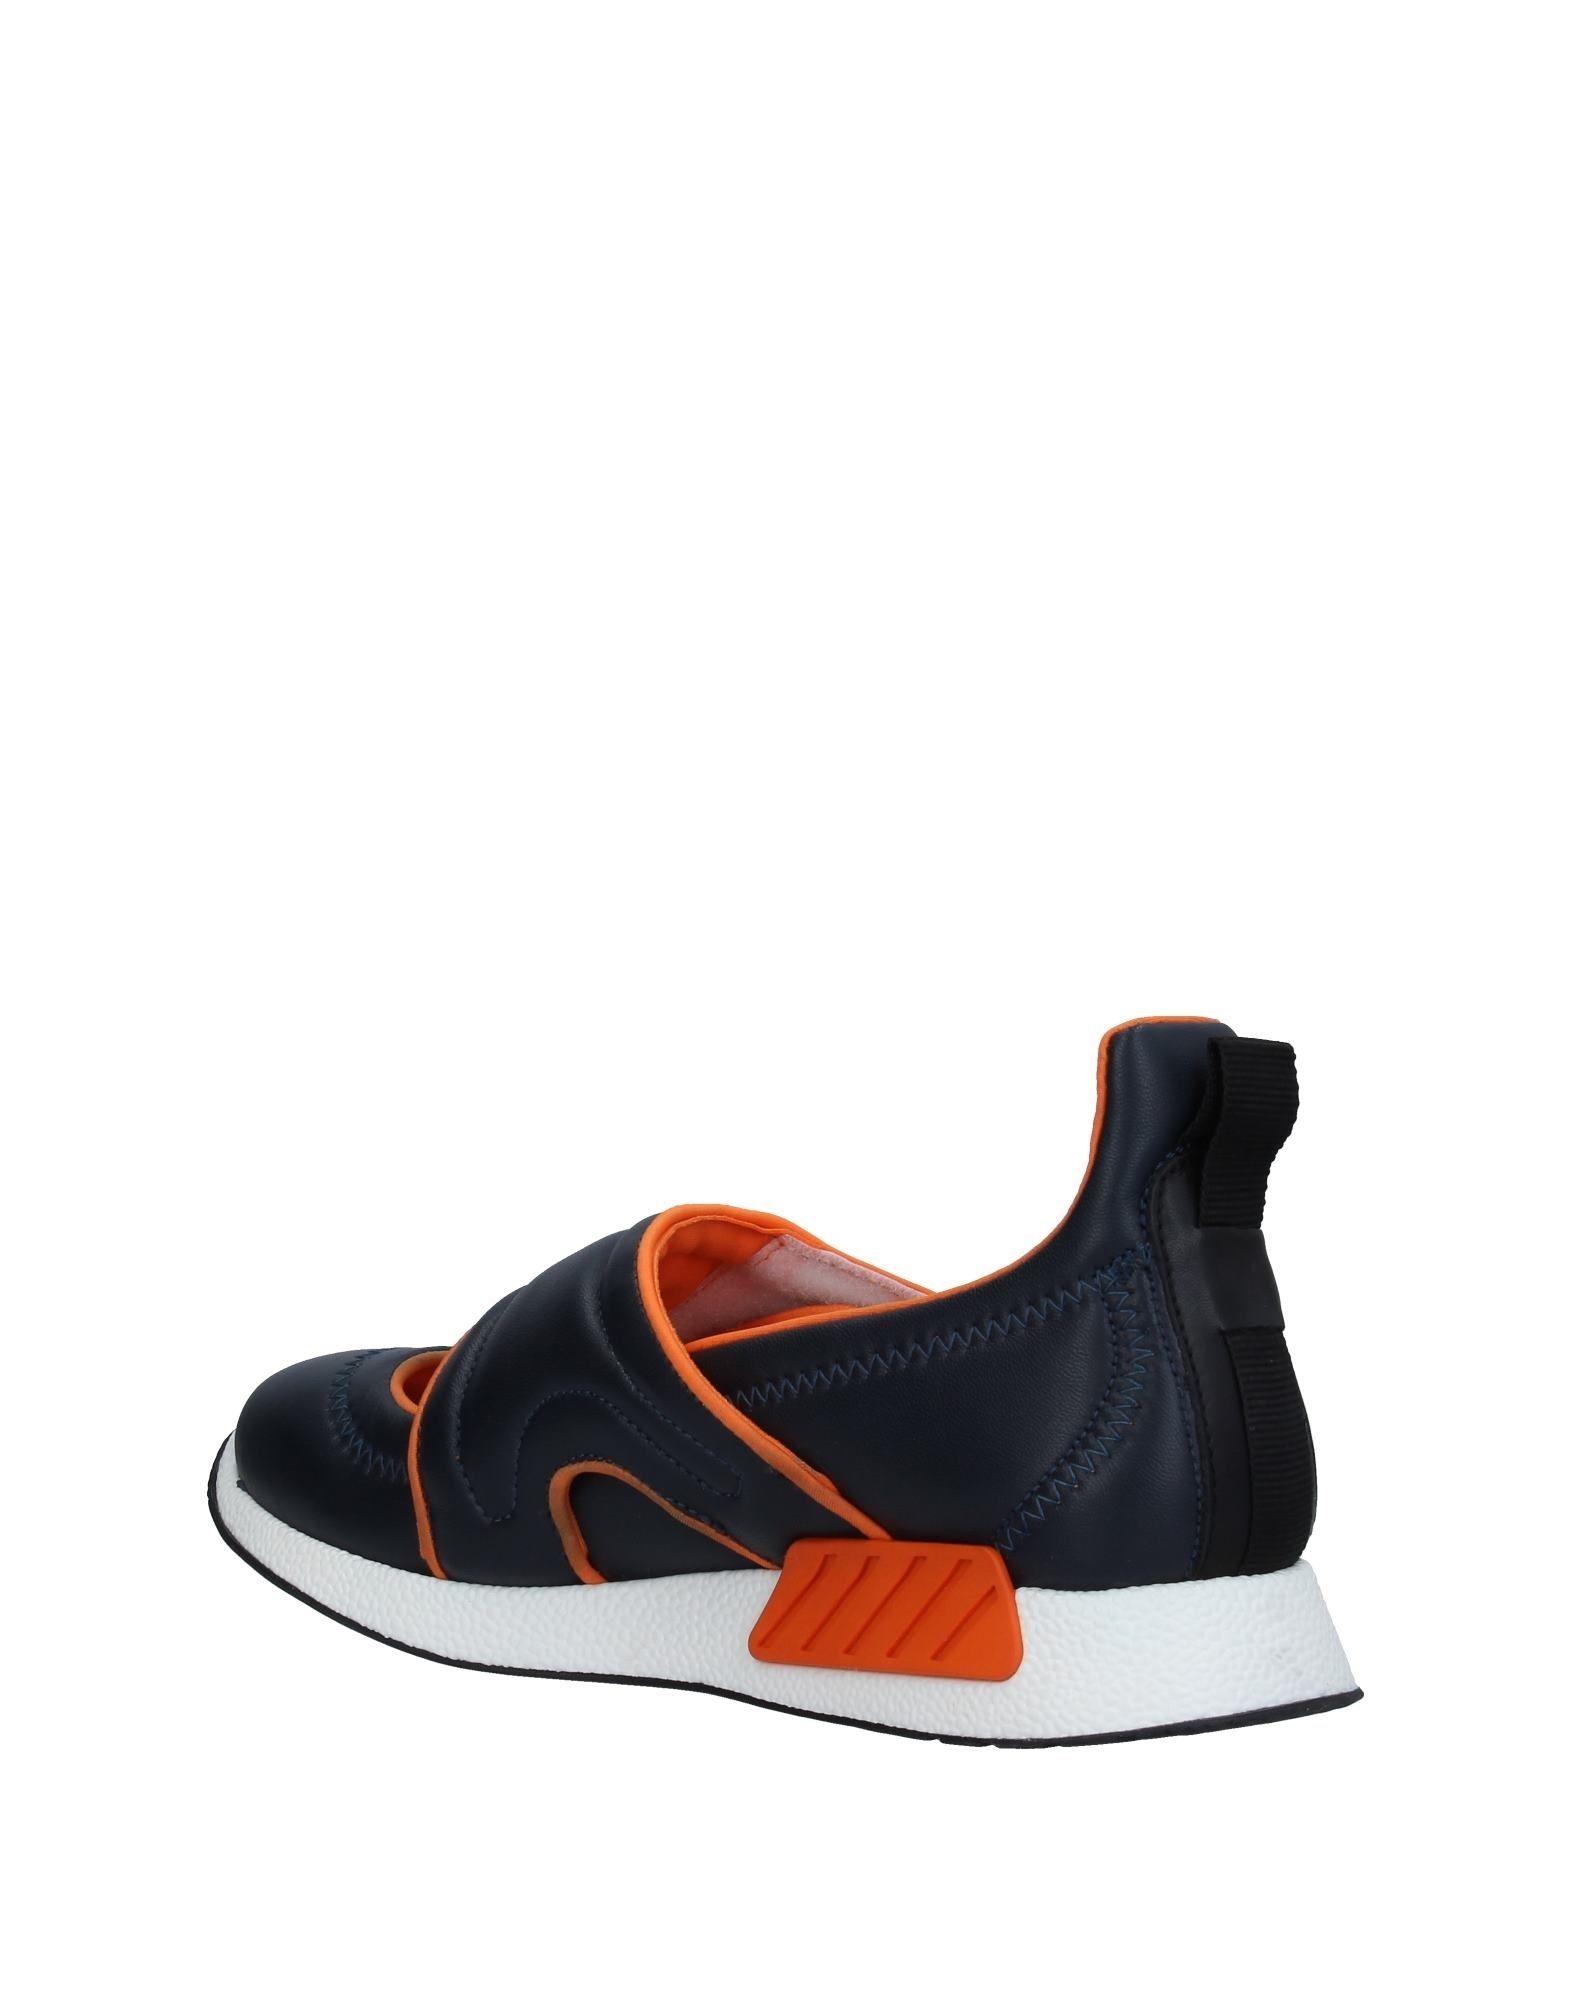 Logan Crossing Sneakers Damen  11339792TO Gute Qualität beliebte Schuhe